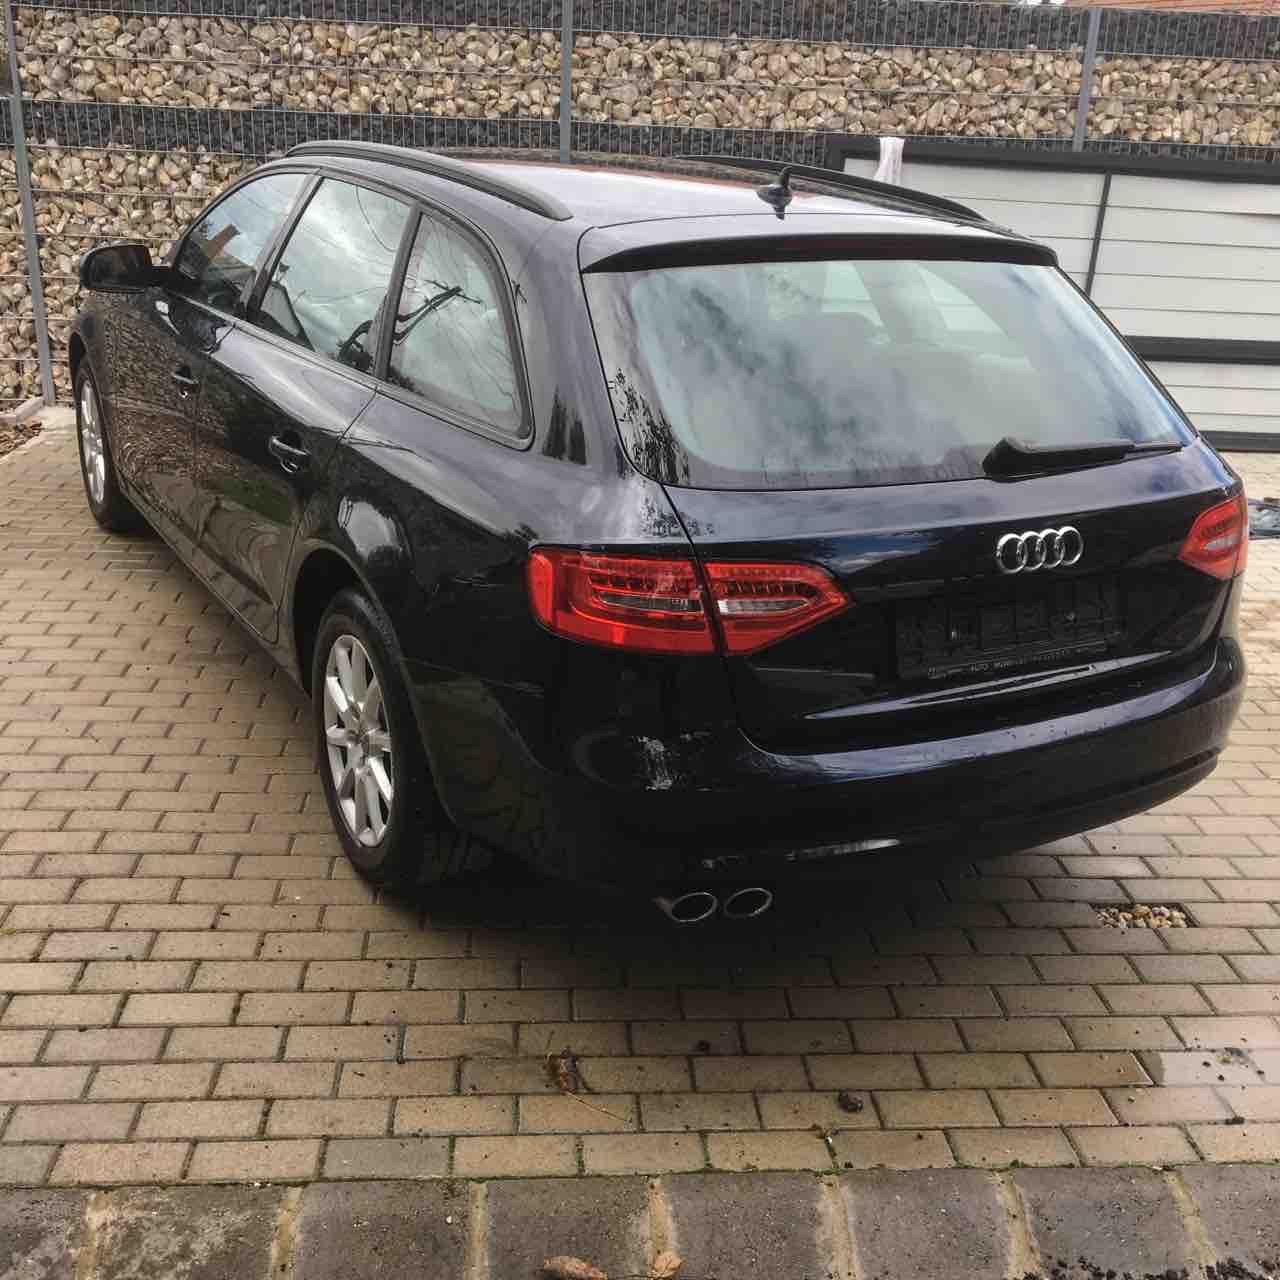 Audi A4 2015 Business 2.0 TDI, 150 PS